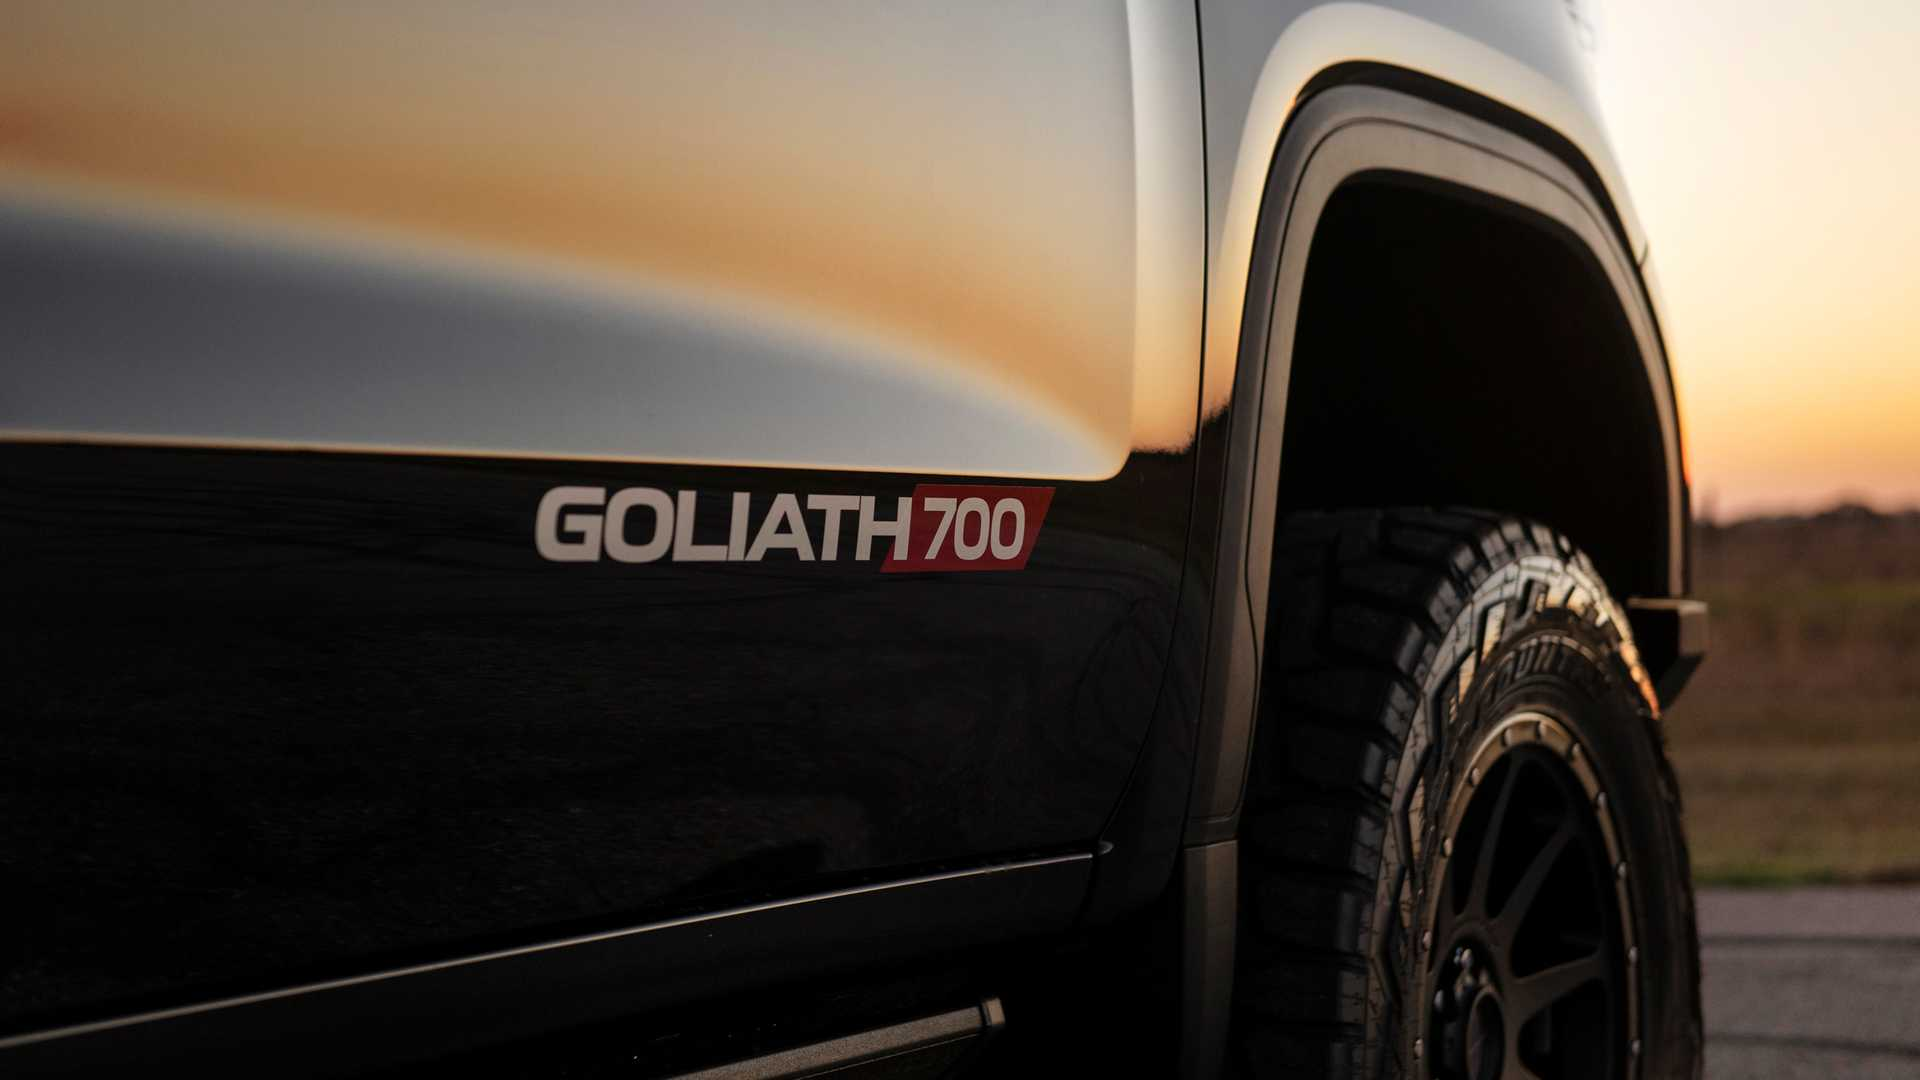 hennessey-goliath-700-gmc-sierra-denali-5